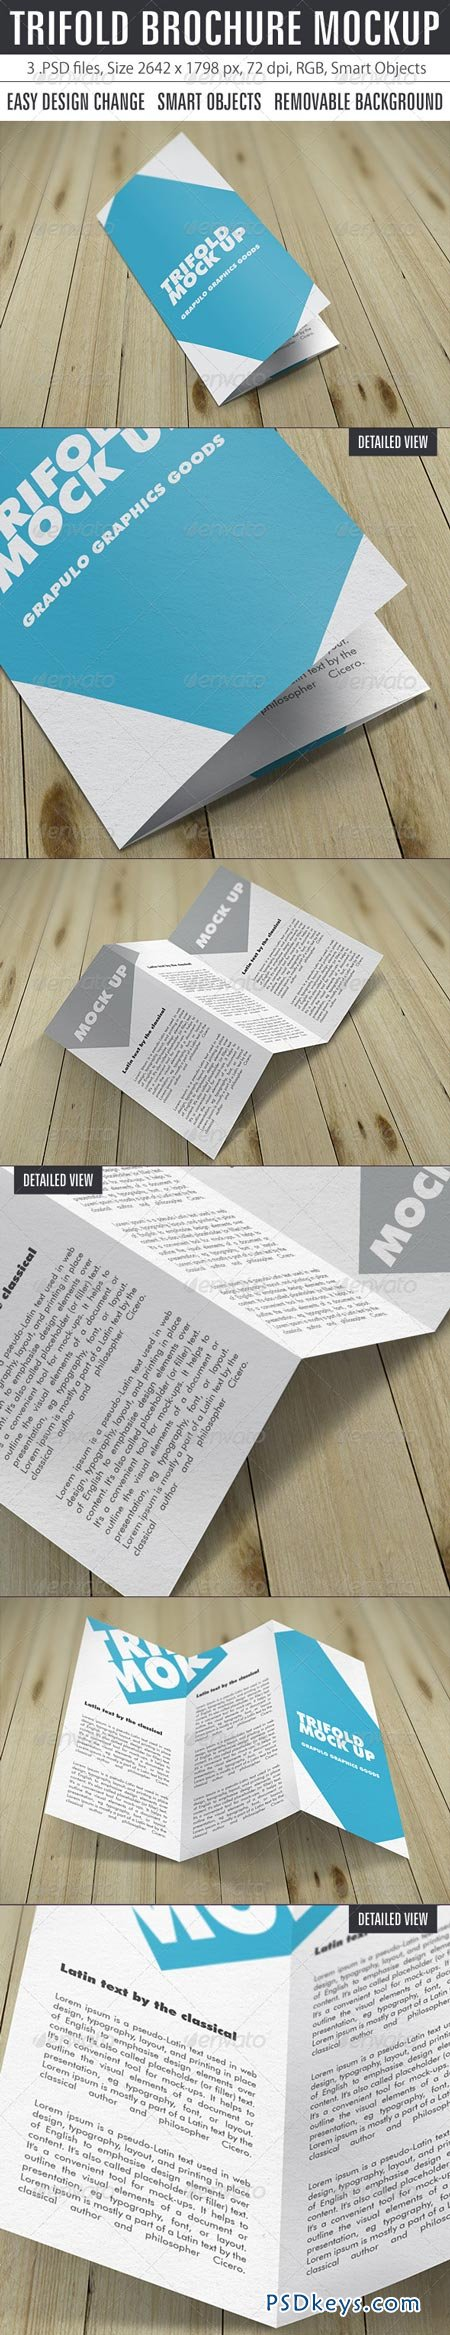 Trifold Brochure Mockup 8412401